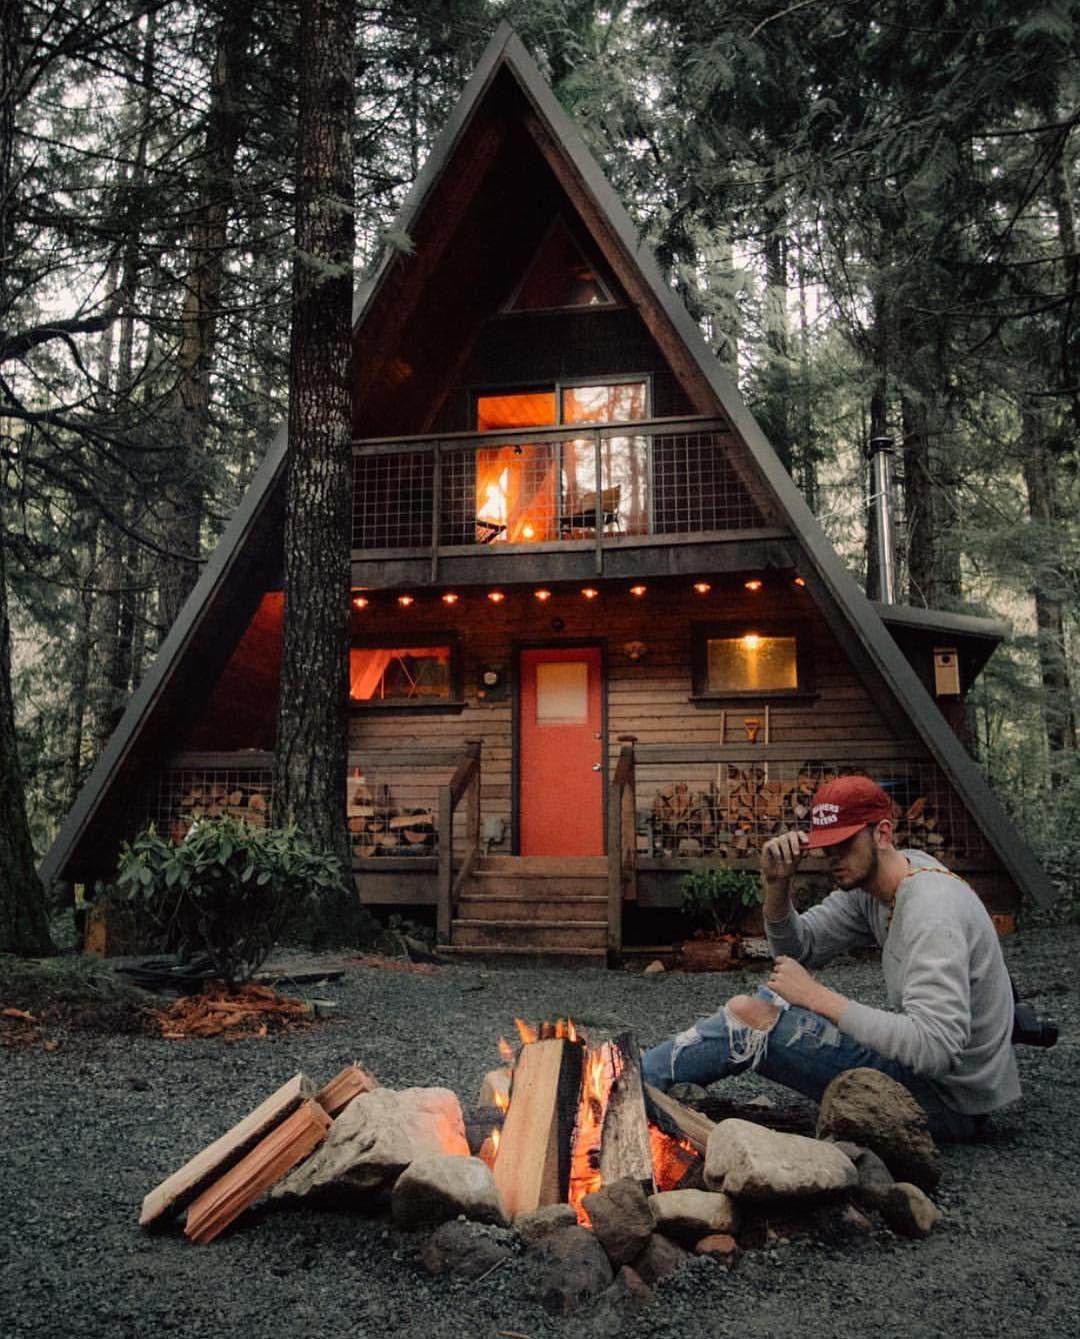 I Love This Cabin Home Follow Me Pinterest Com Mrcafer Youtube Mr Cafer Mrcafer Blogspot Com Small Log Cabin A Frame House Log Cabin Homes